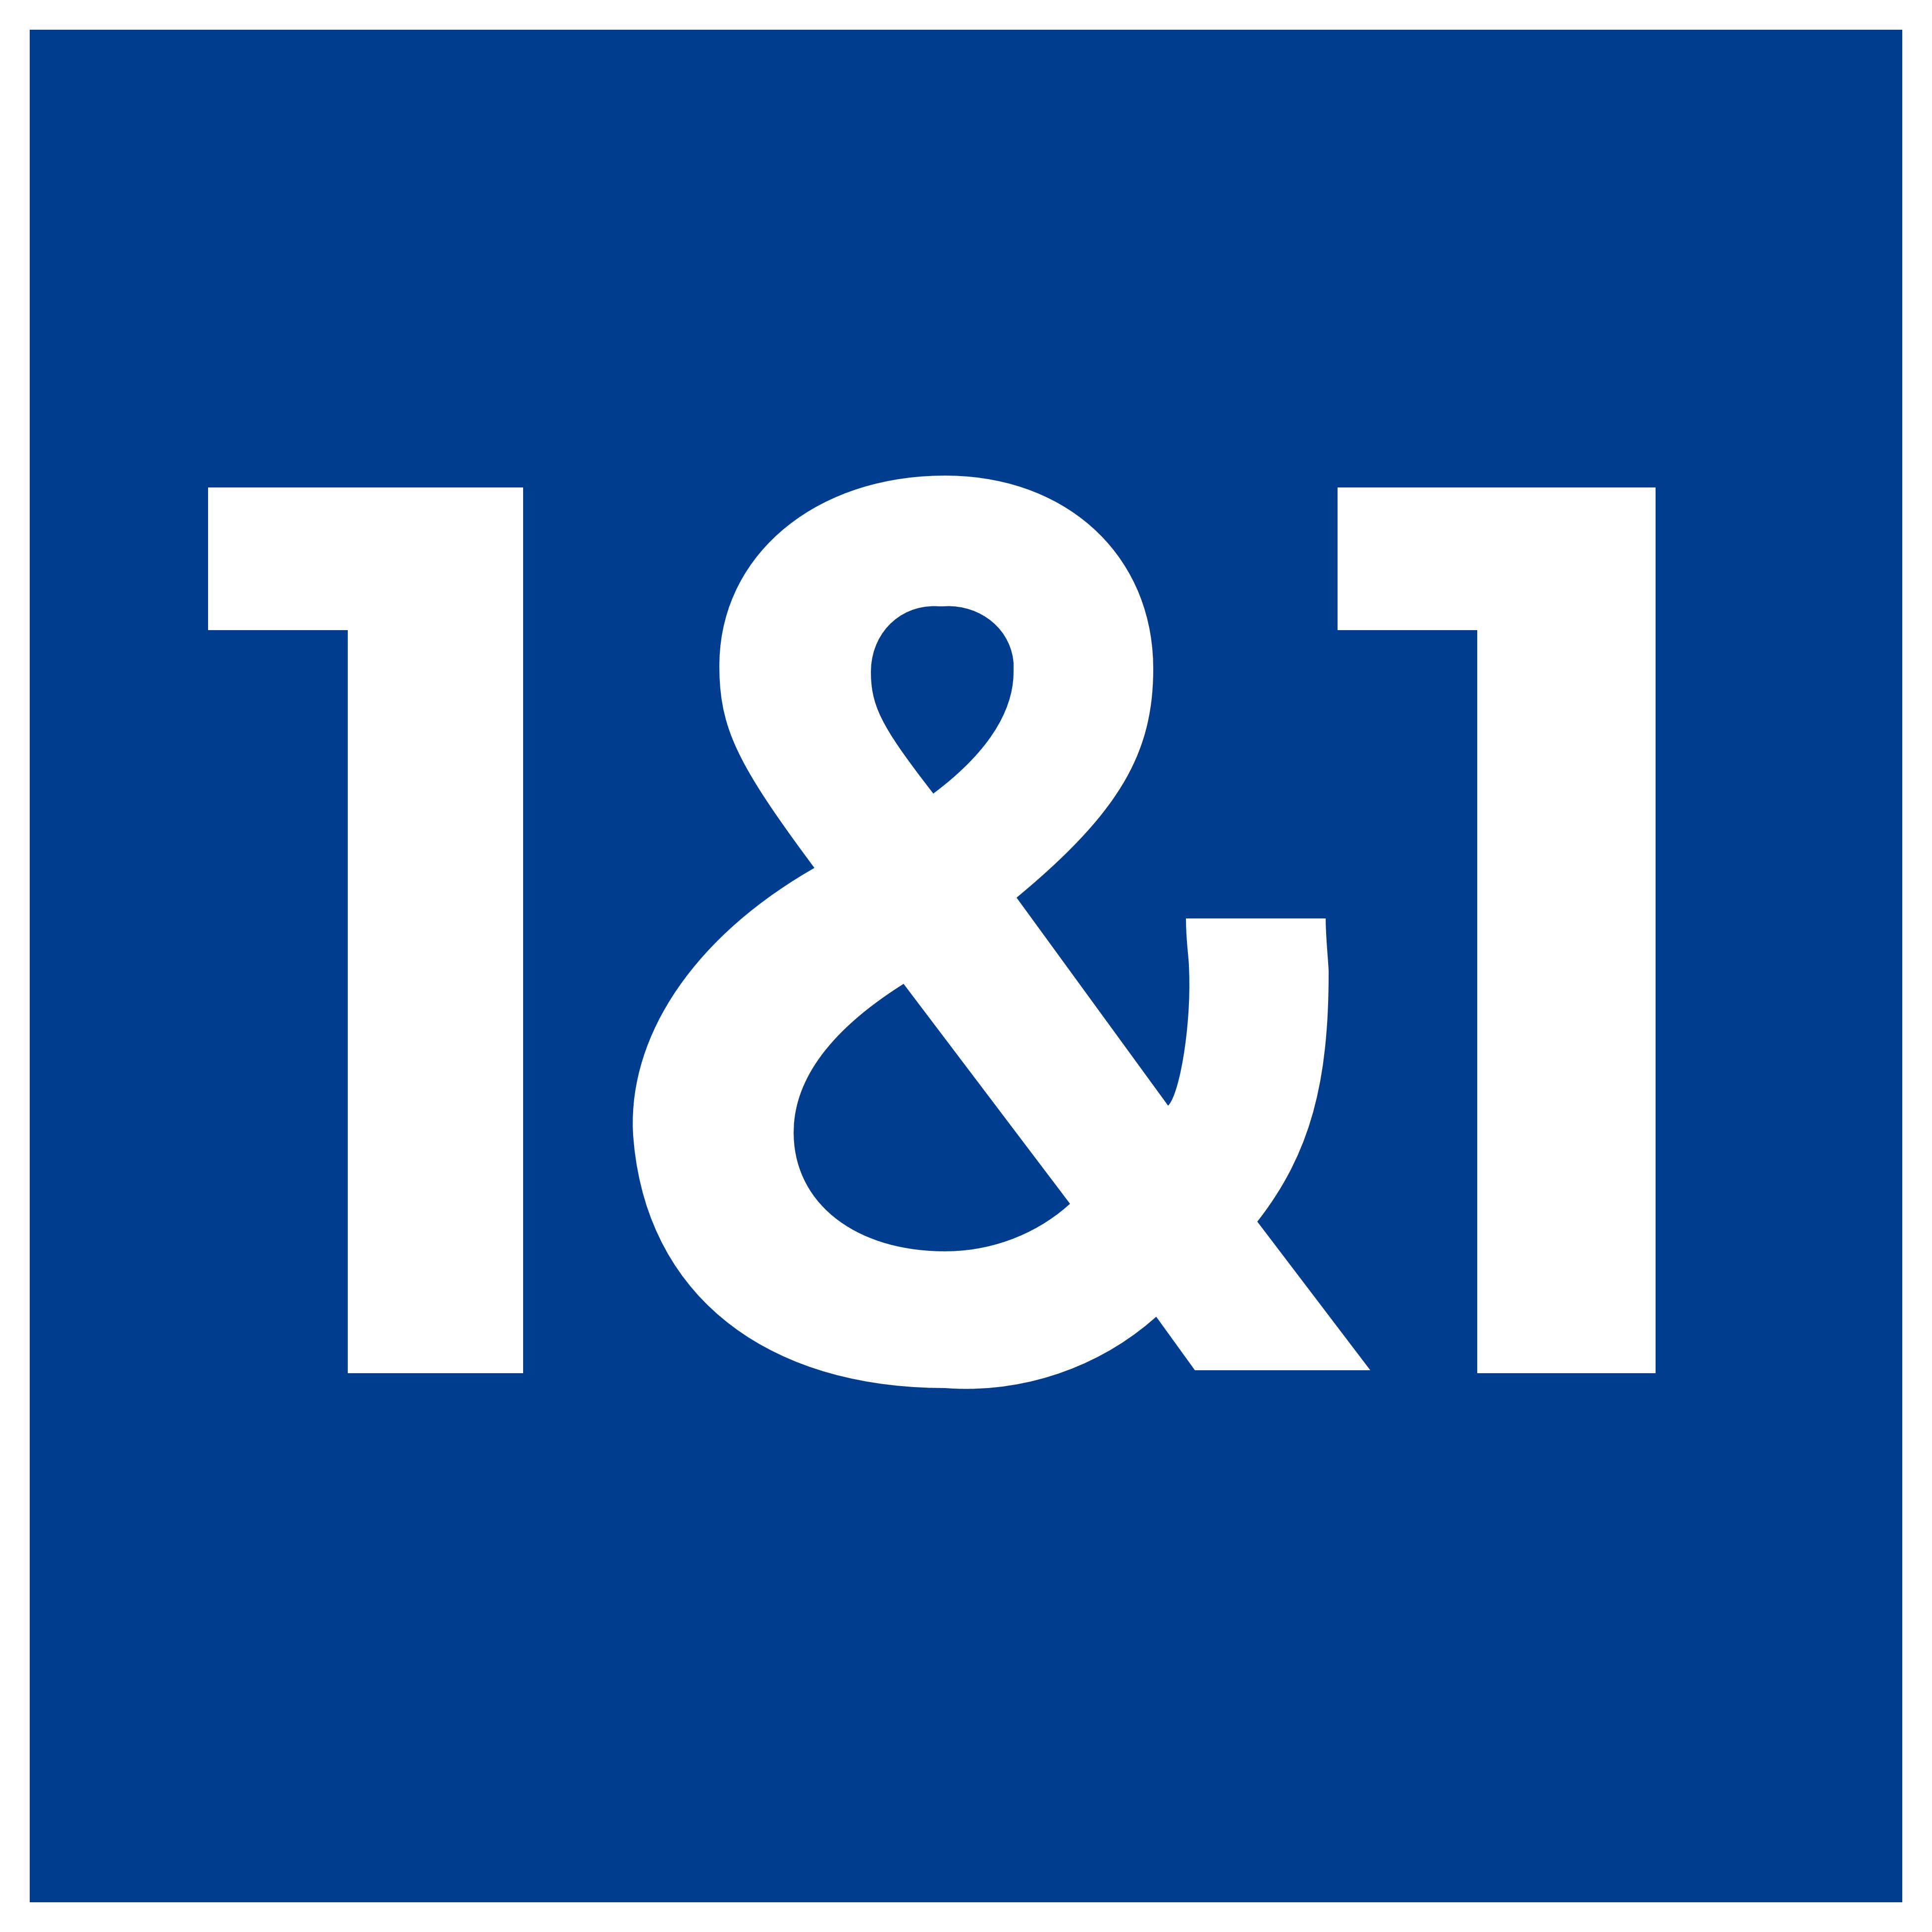 1u00261 logo (1 and 1) - And1 Logo Vector PNG